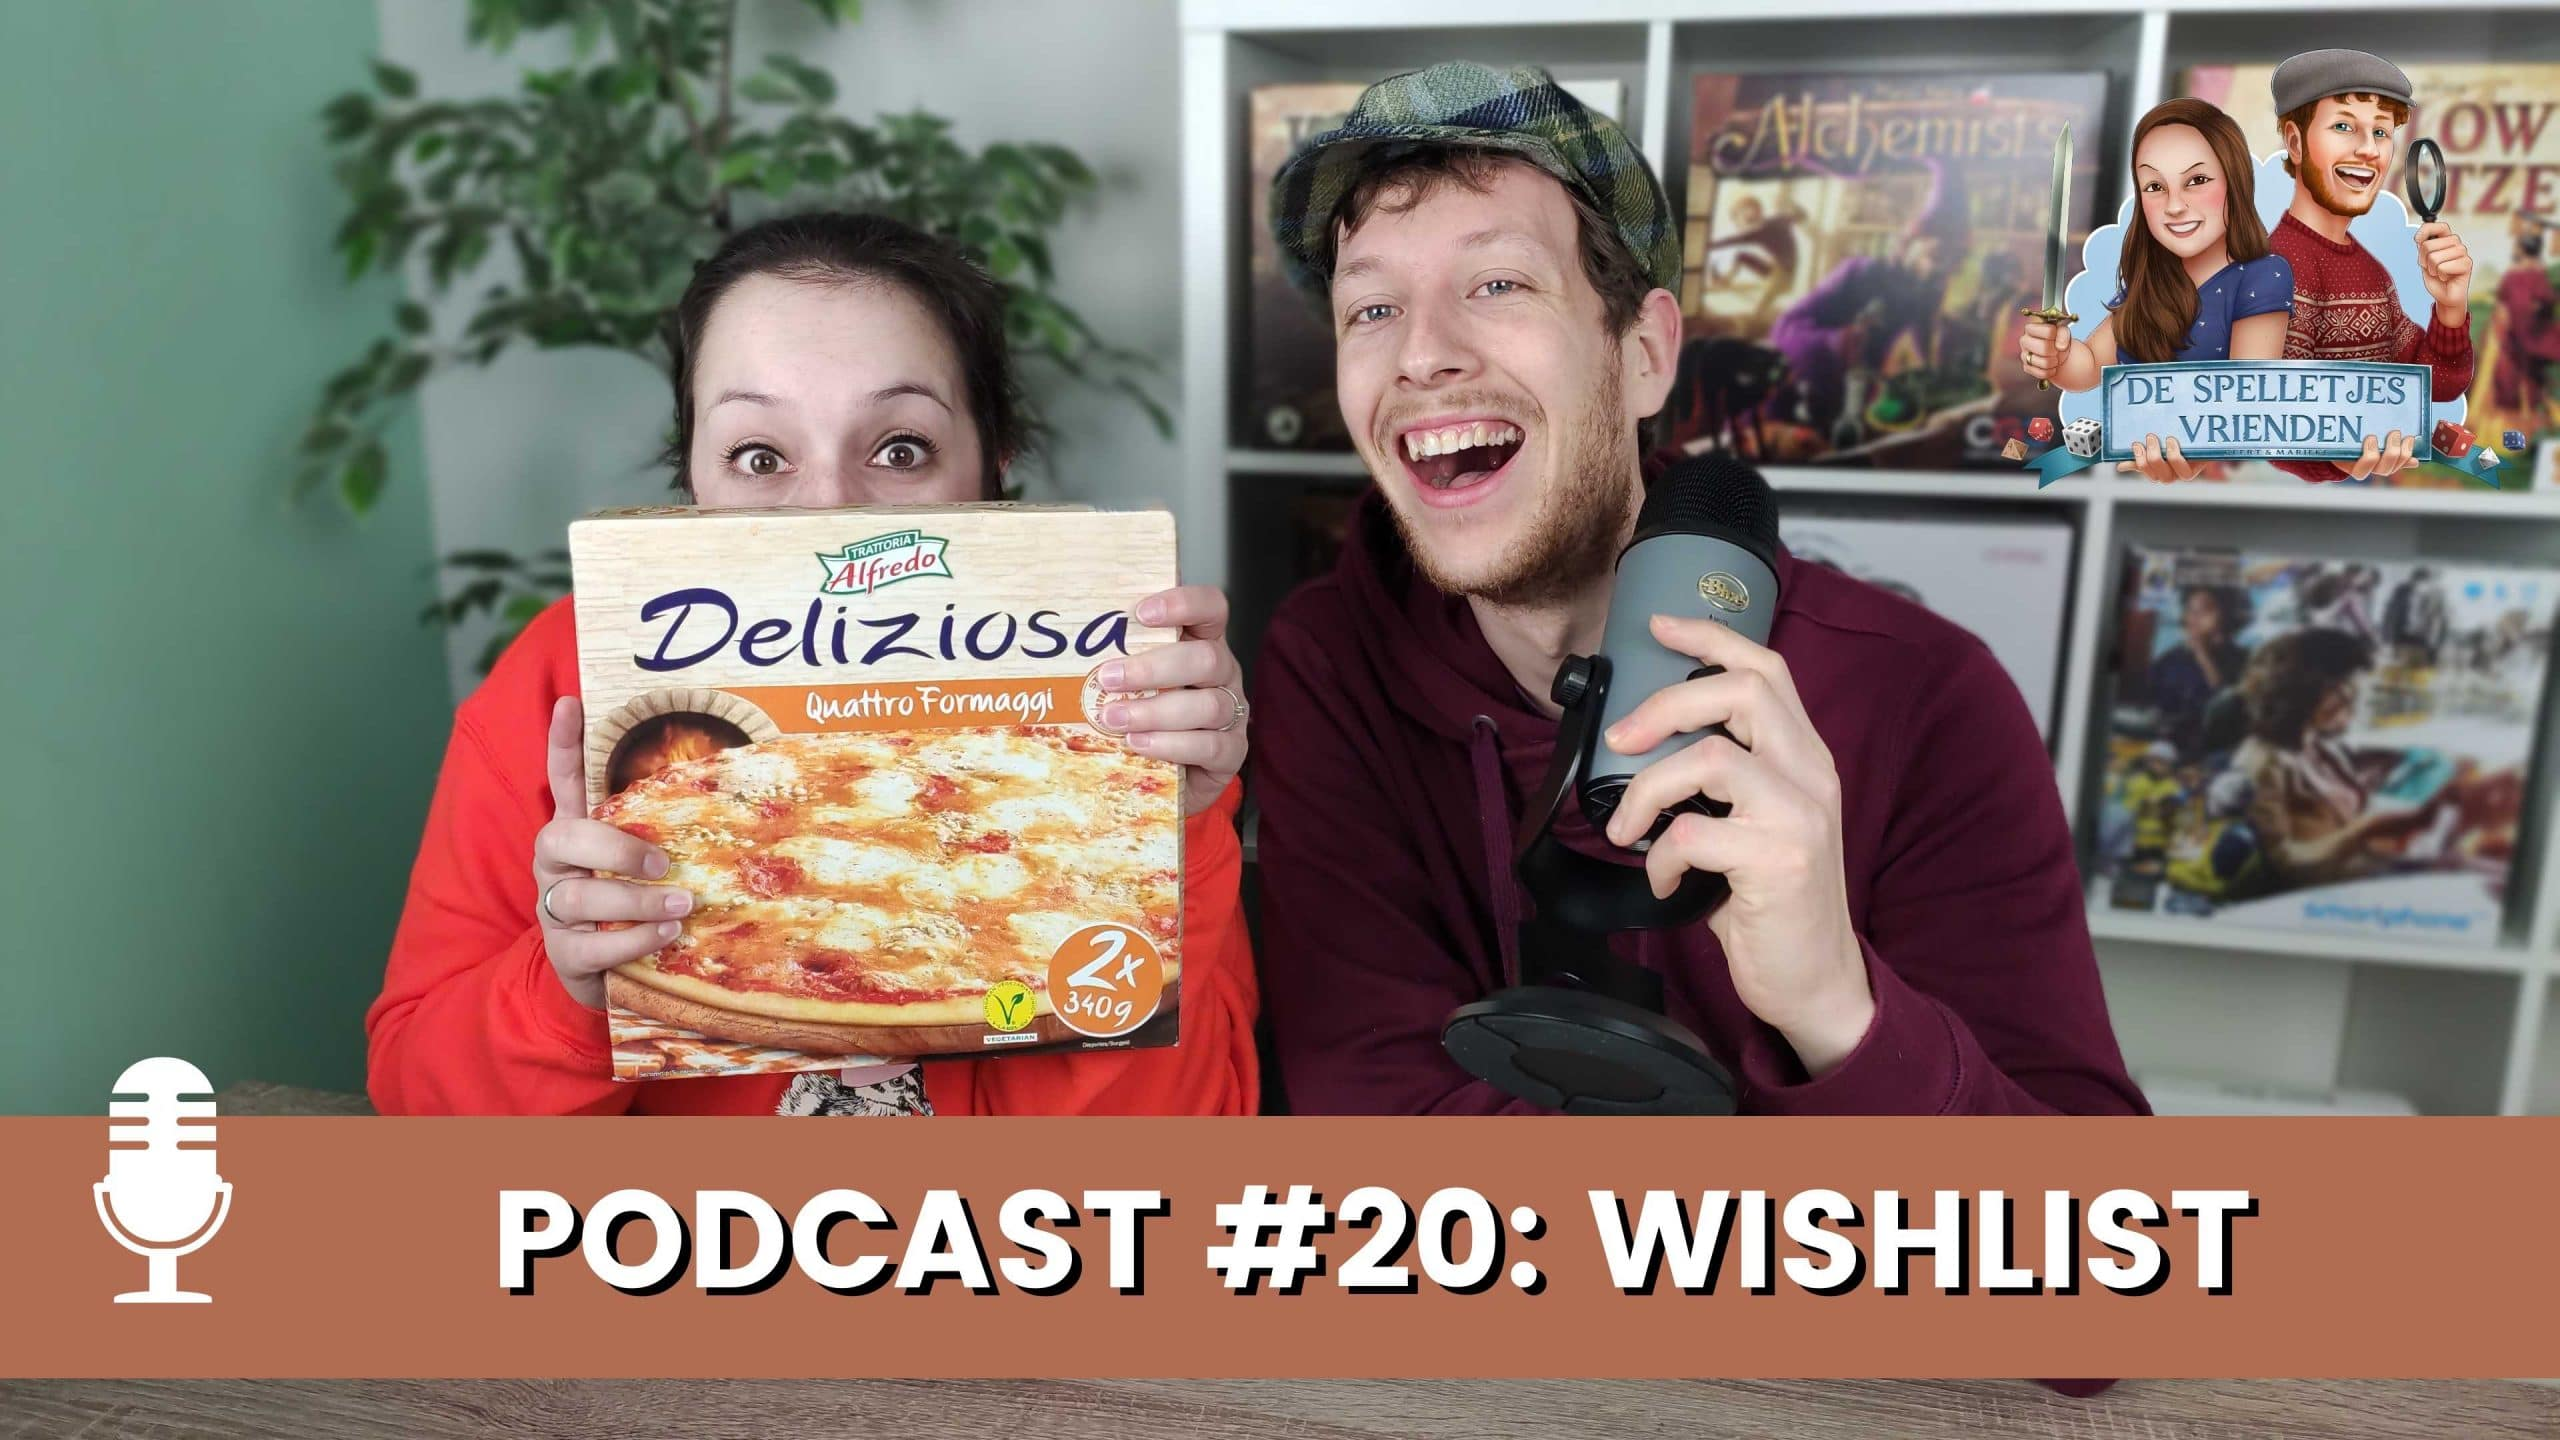 bordspel-podcast-wishlis